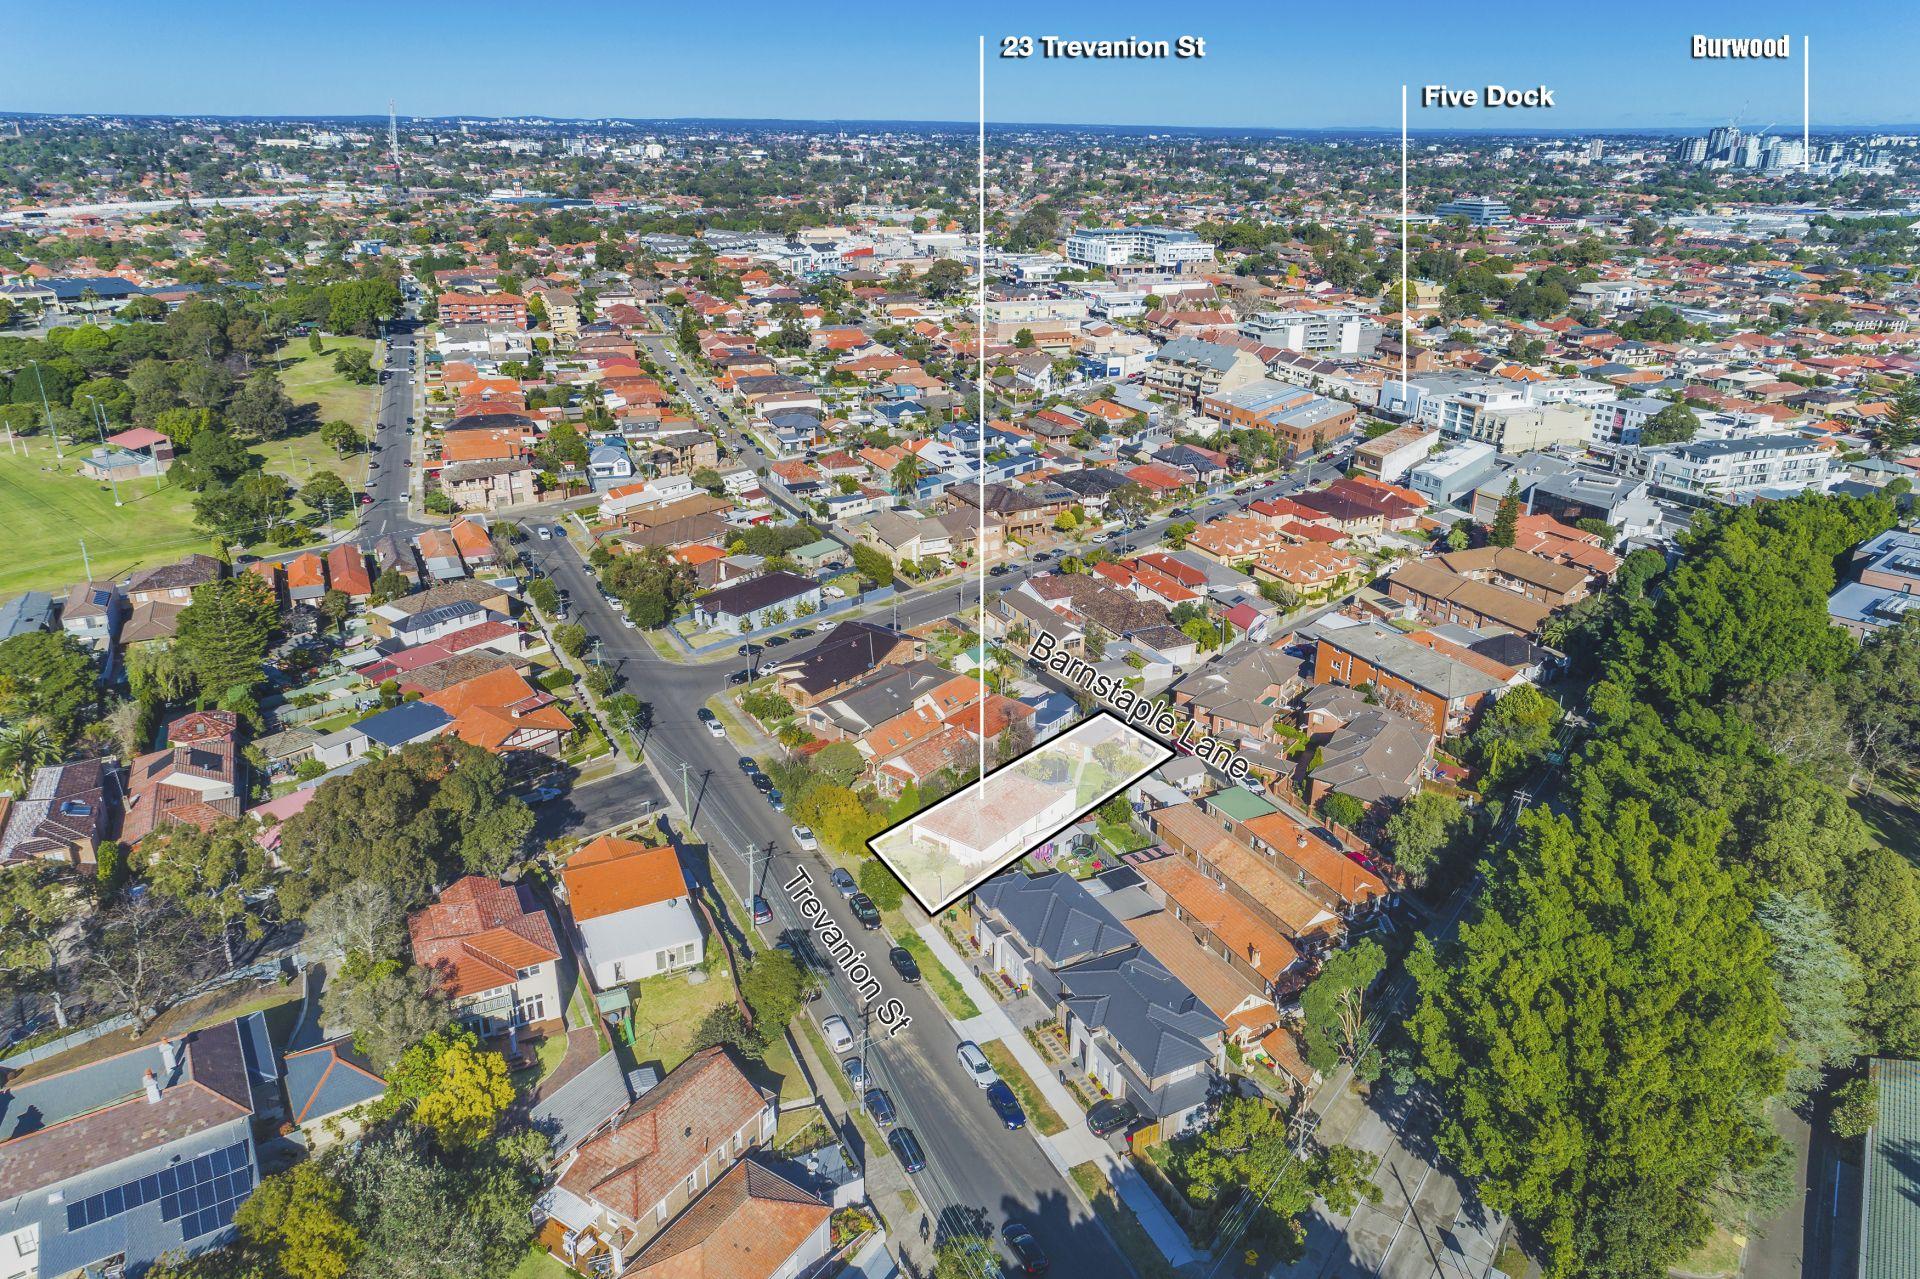 23 Trevanion Street, Five Dock NSW